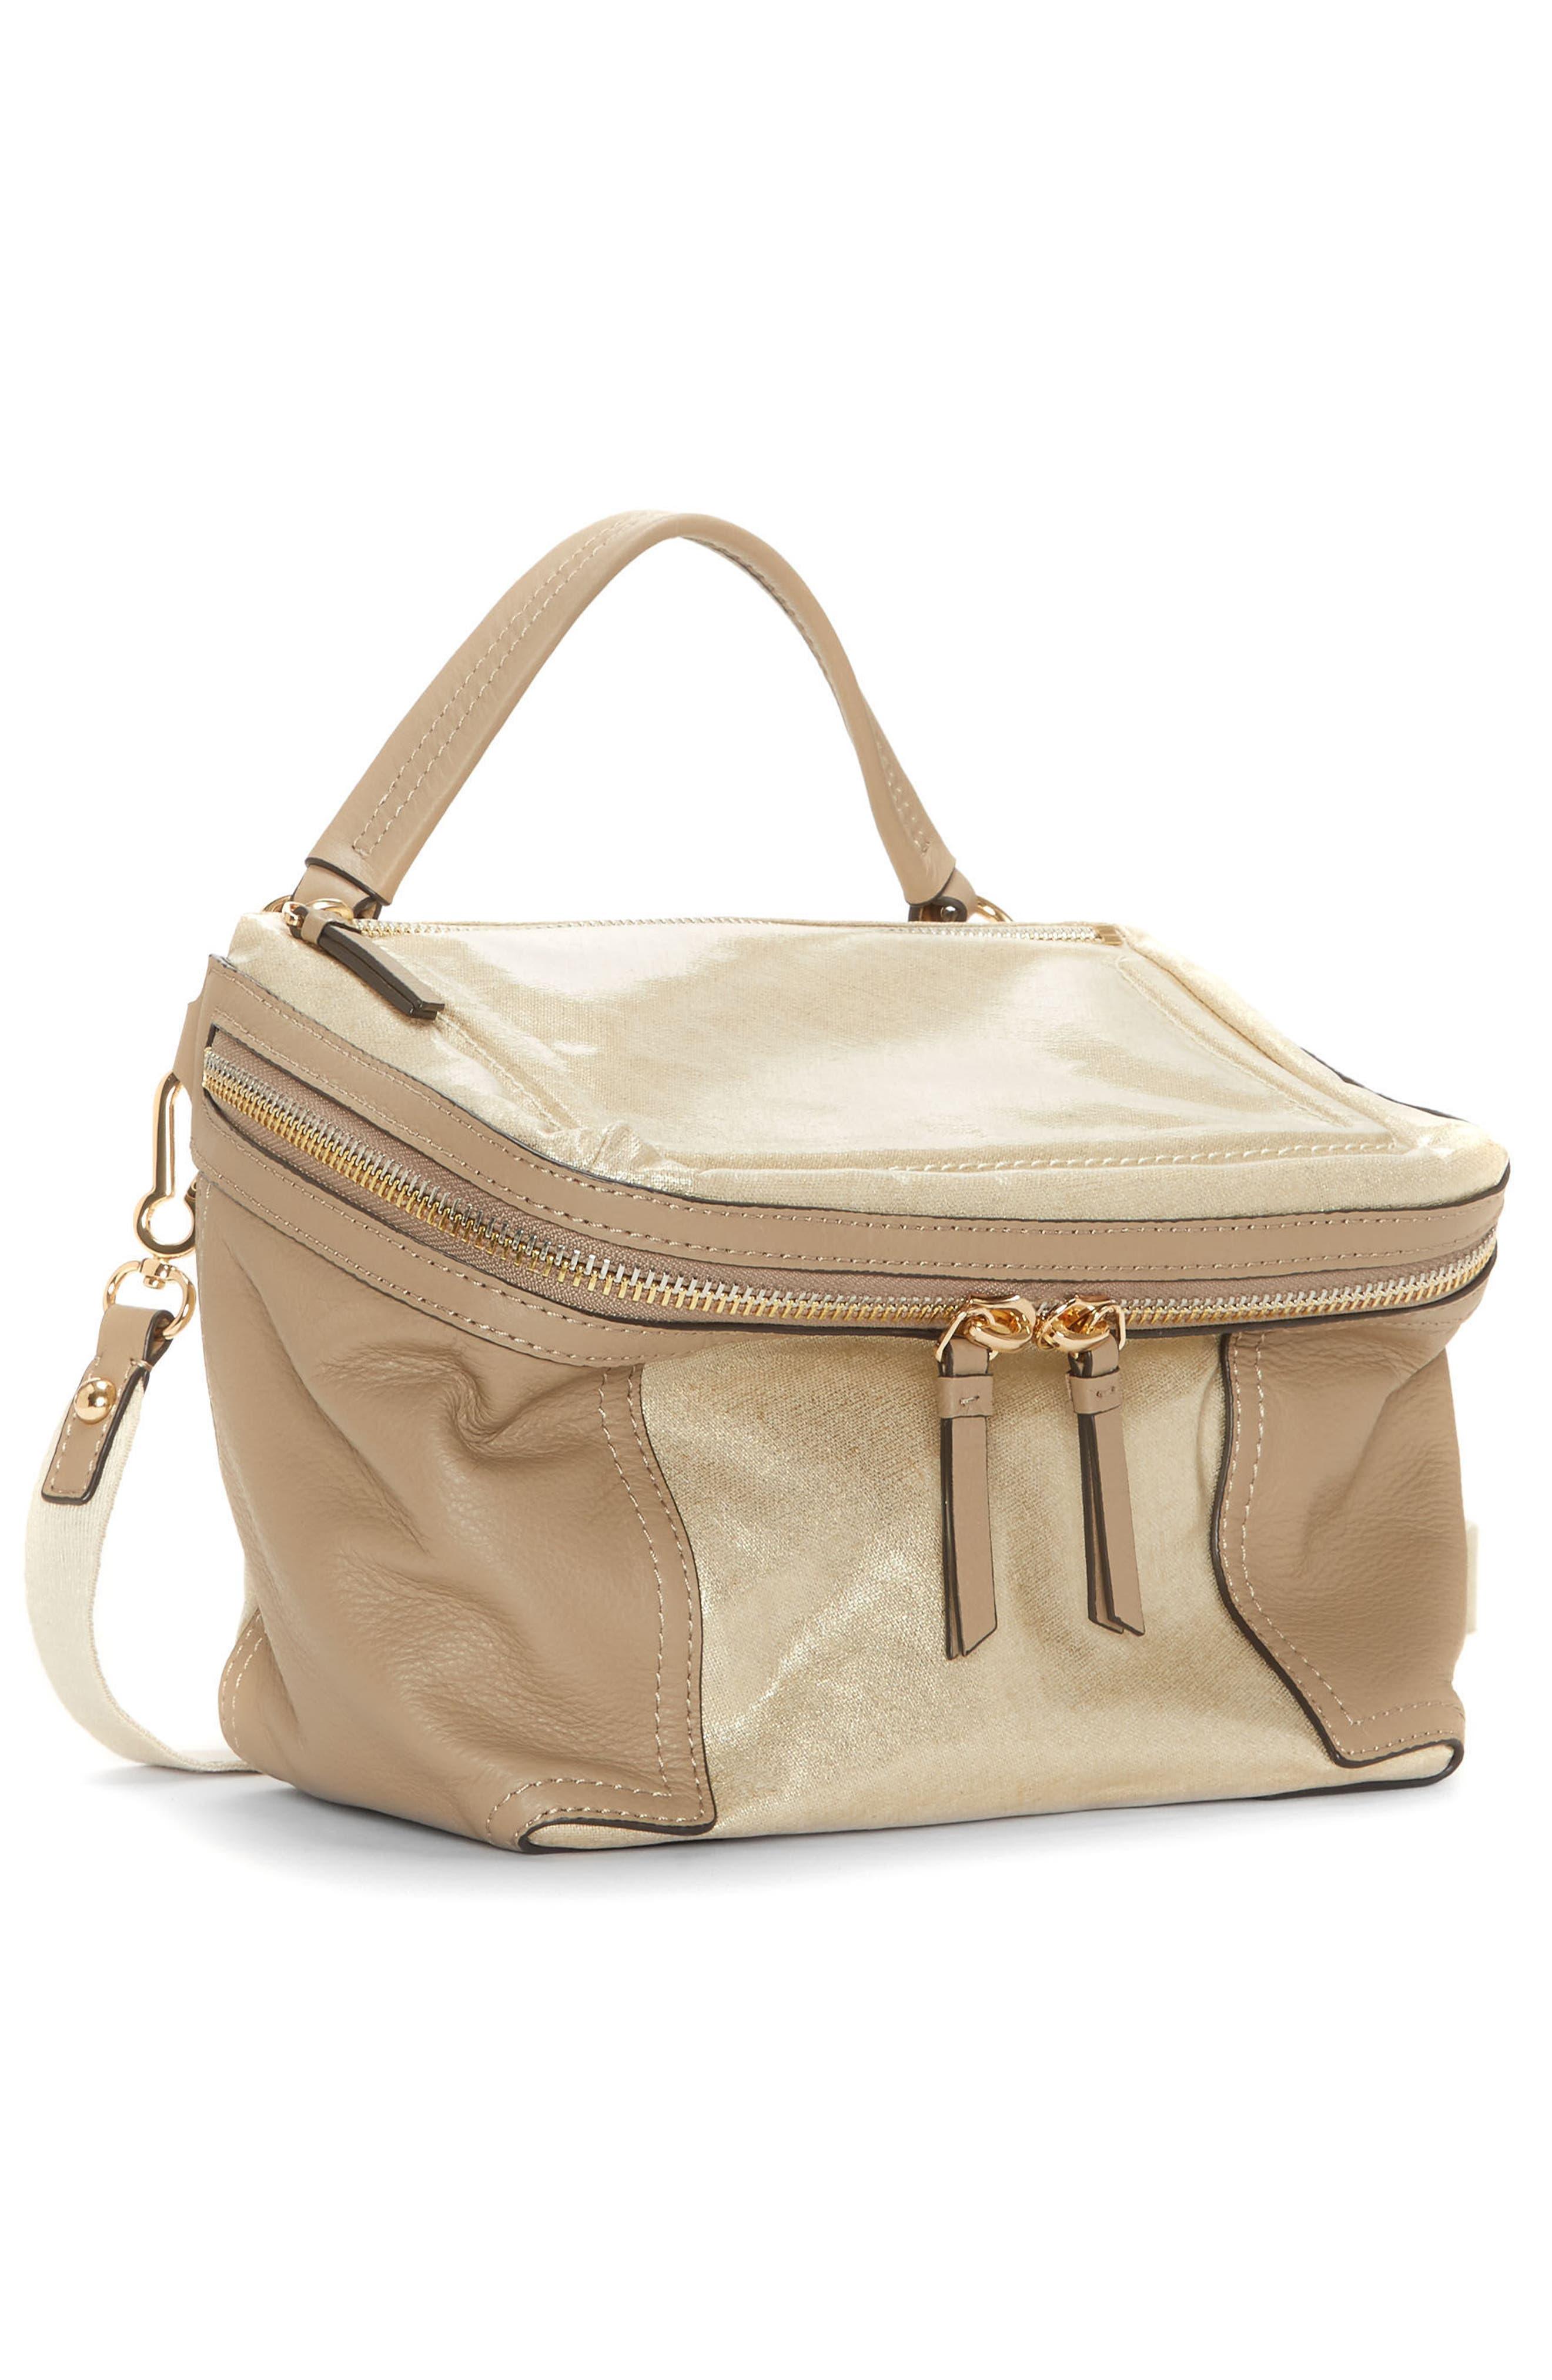 Medium Patch Nylon & Leather Crossbody Bag,                             Alternate thumbnail 4, color,                             Gold